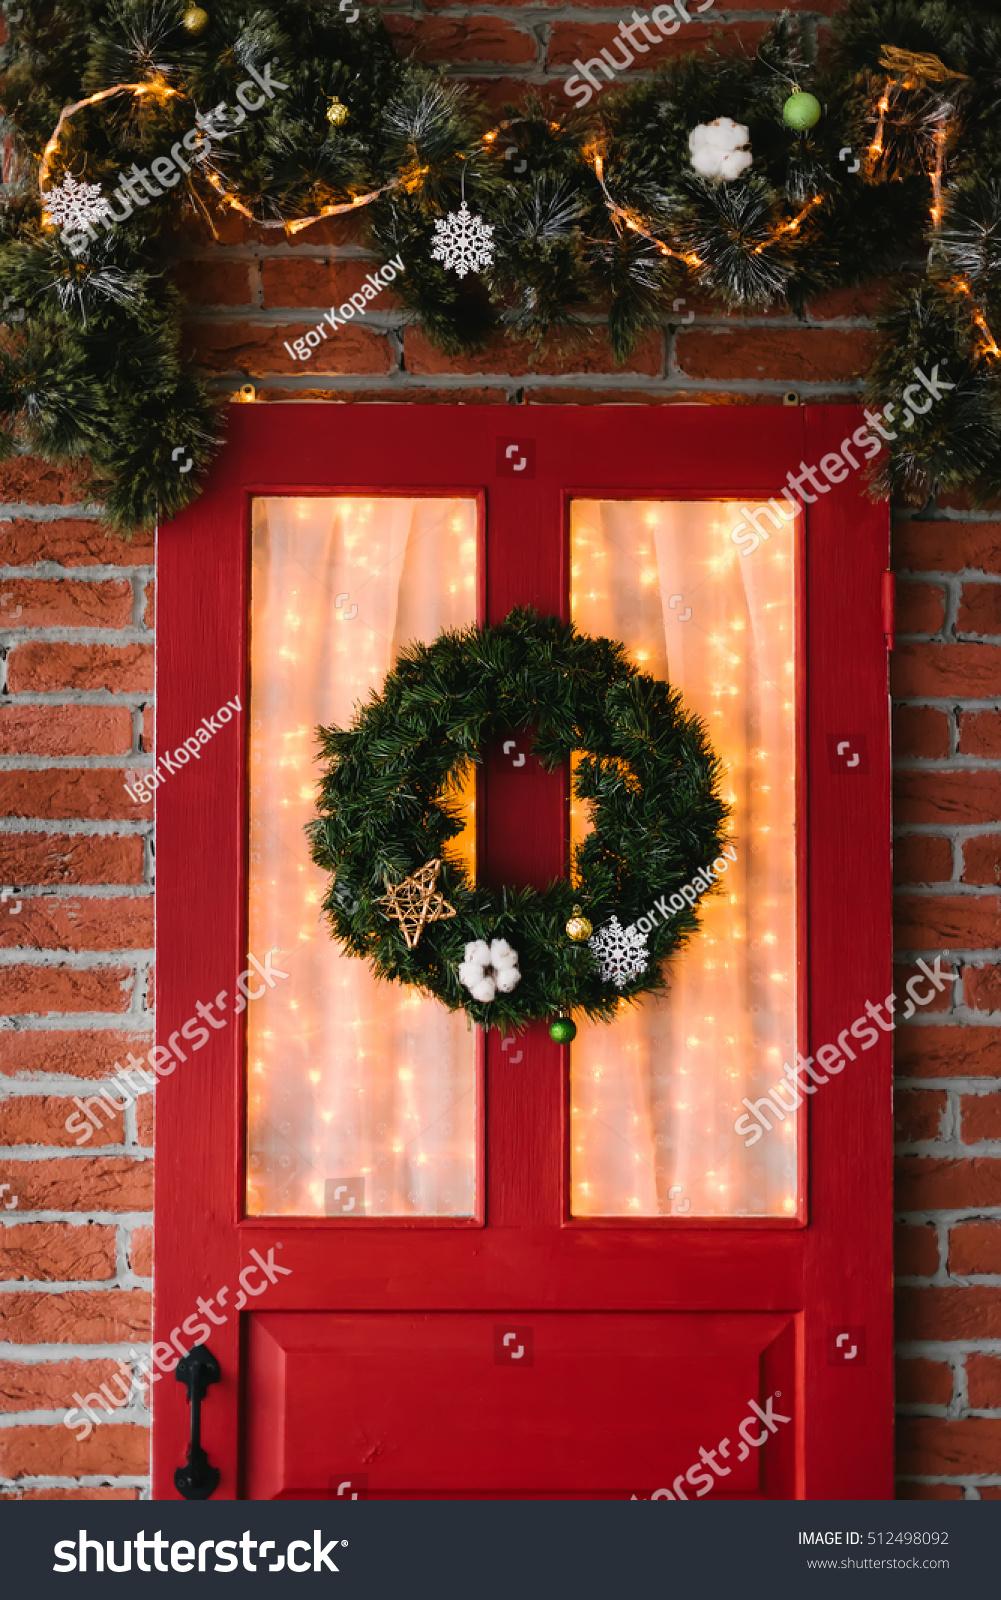 Christmas Wreath On Red Door Stock Photo Edit Now 512498092